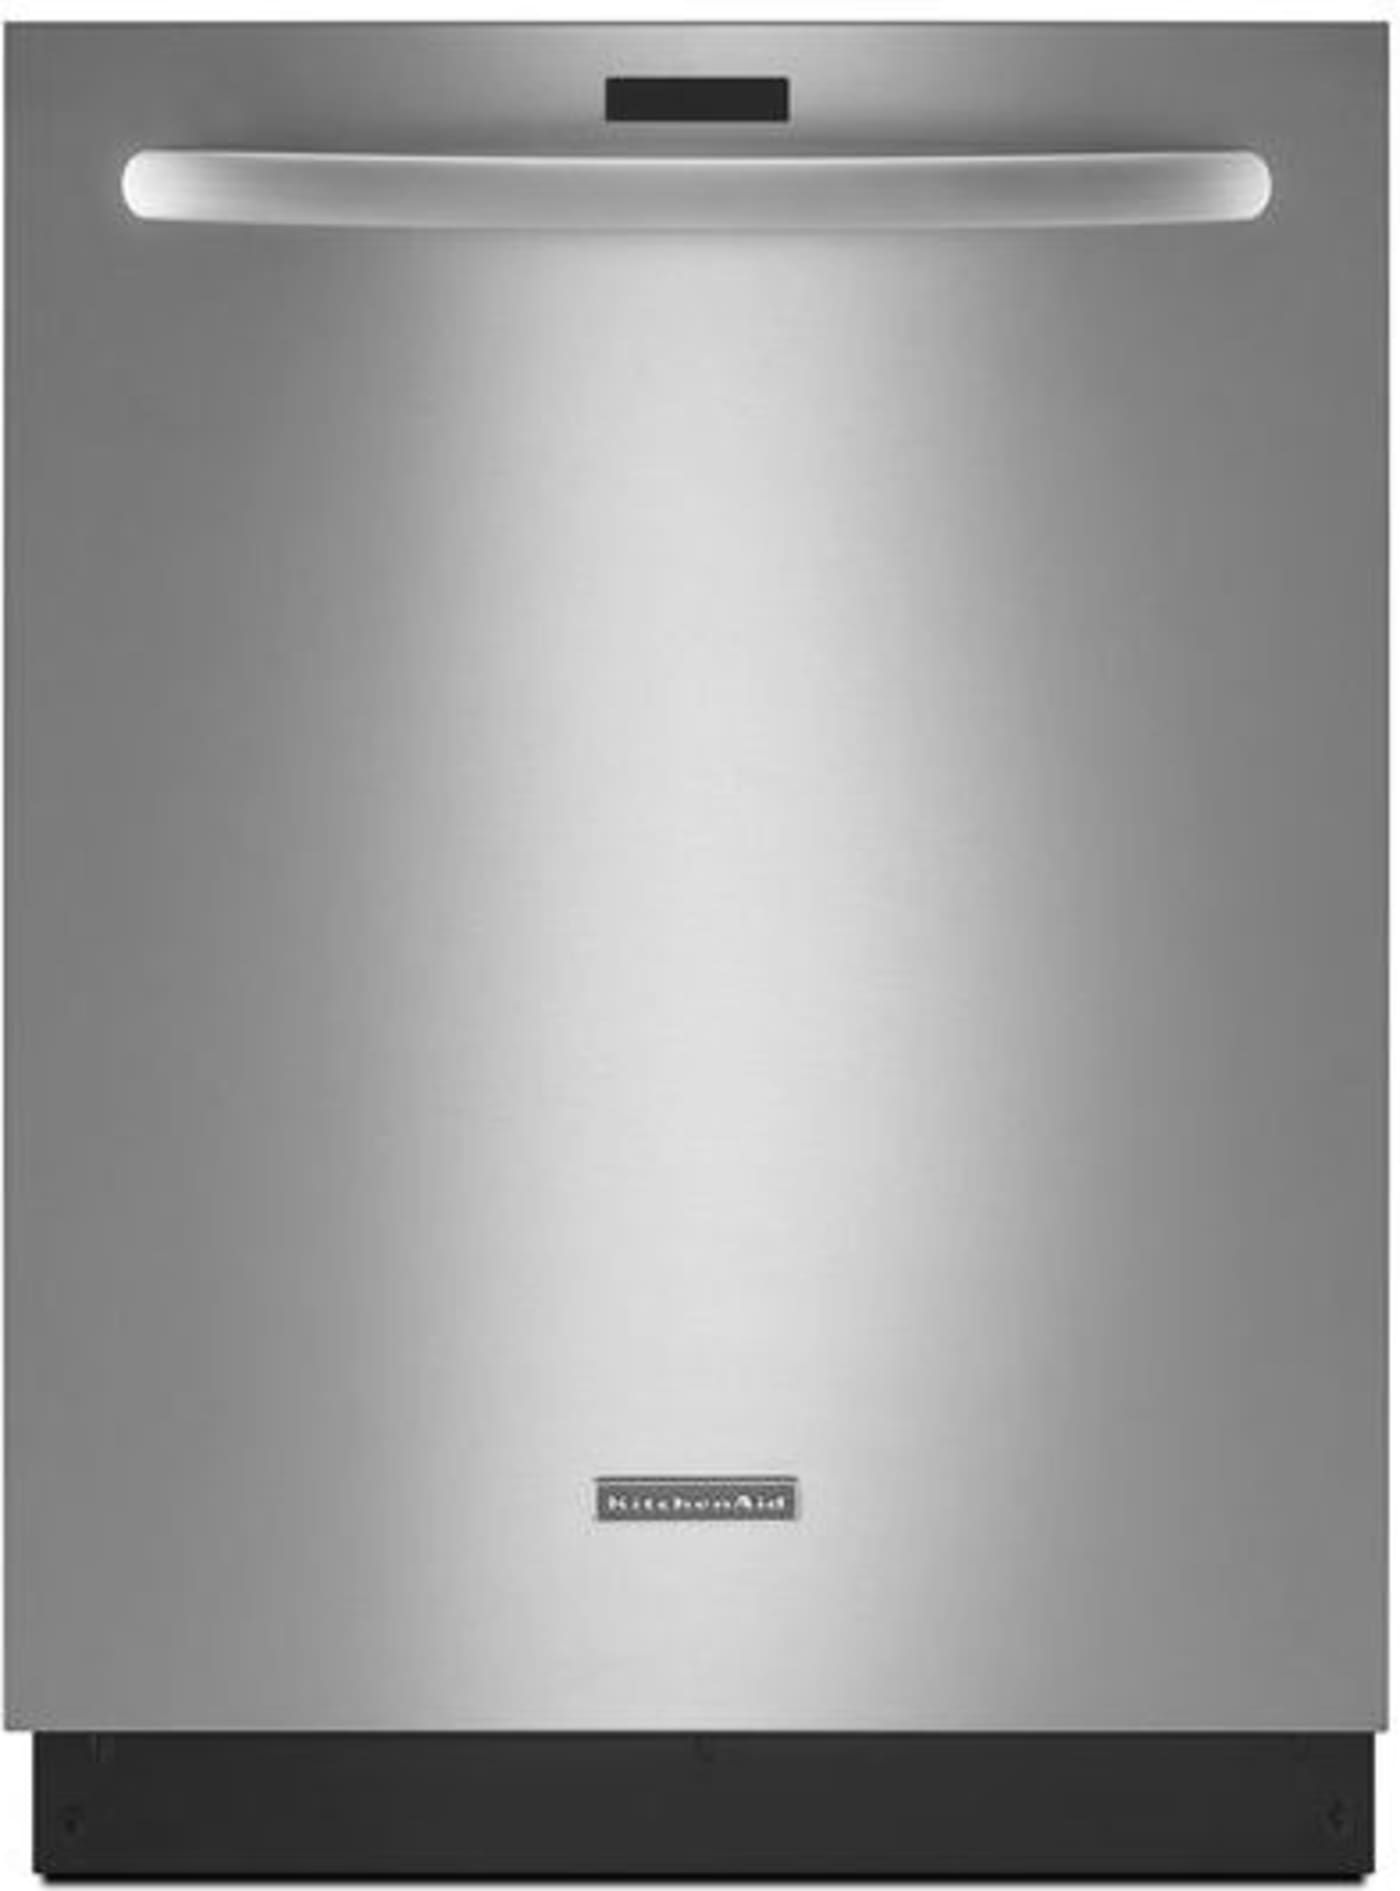 Kdtm354dss By Kitchenaid Fully Integrated Dishwashers Goedekers Com Integrated Dishwasher Kitchen Aid Appliances Kitchenaid Dishwasher